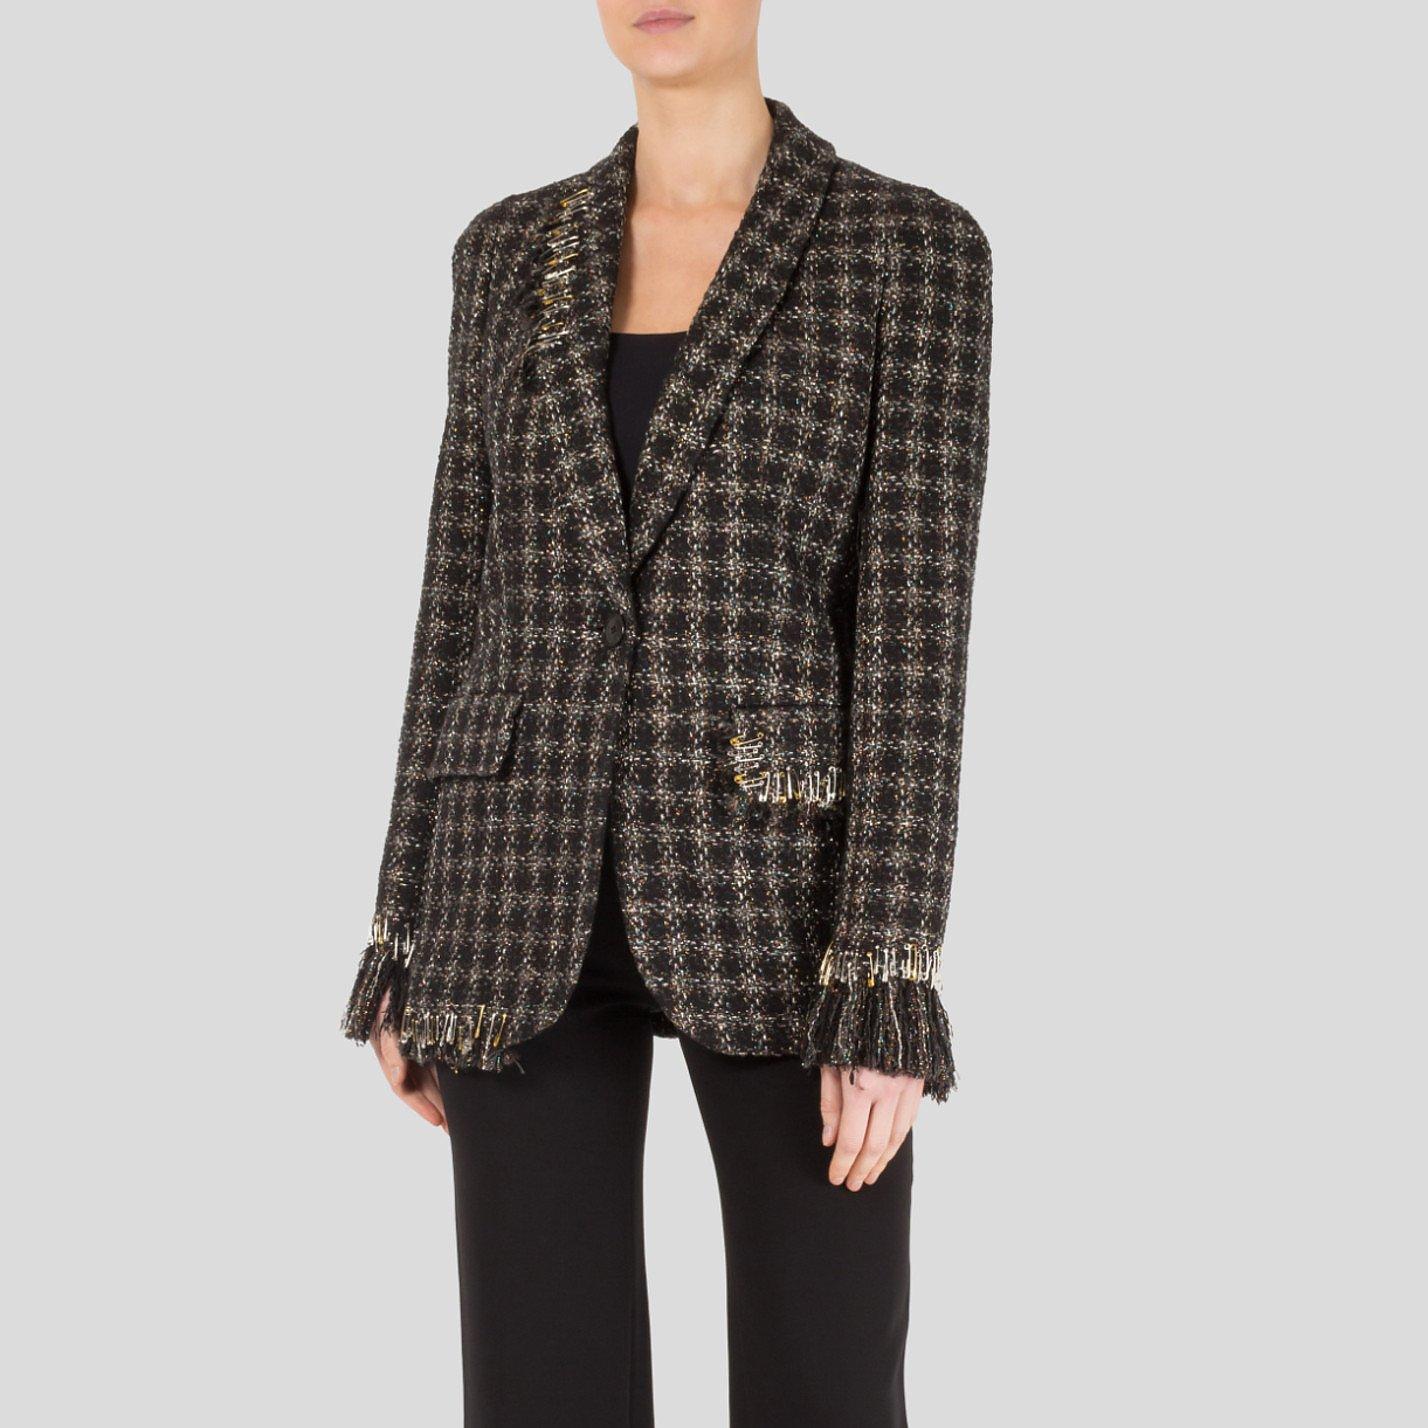 Sonia Rykiel Tweed Jacket With Safety Pin Embellishment